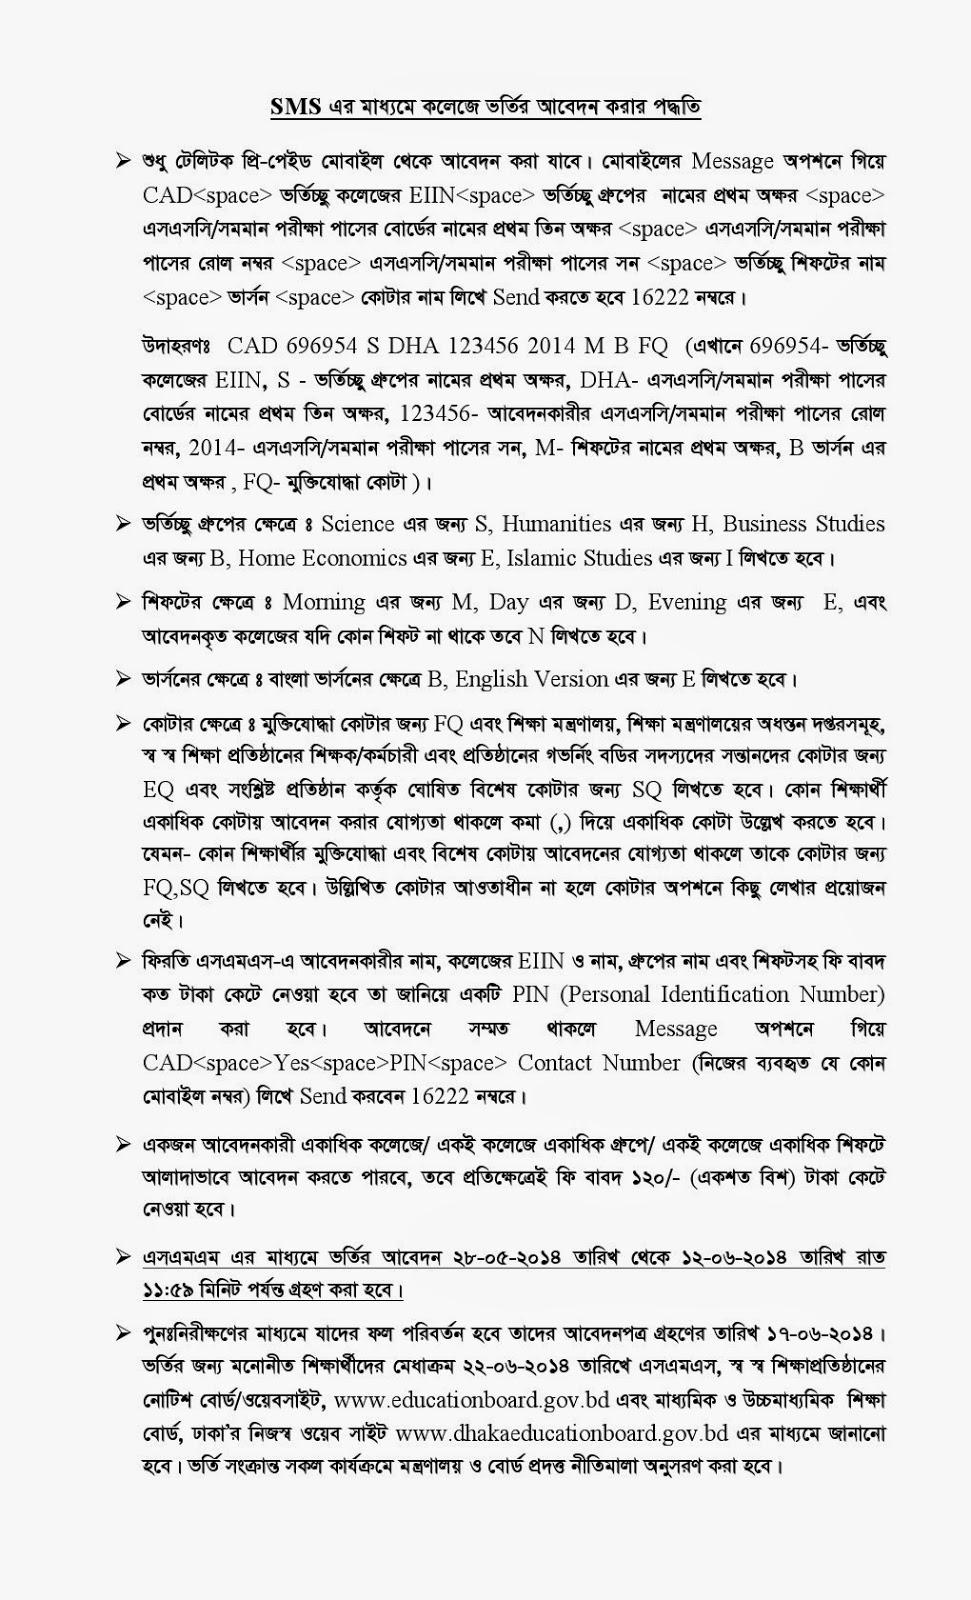 HSC ভর্তি ২০১৪ এর SMS এর মাধ্যমে আবেদন করার পদ্ধতি HSC Admission 2014 by SMS, HSC Admission Notice 2014-2015